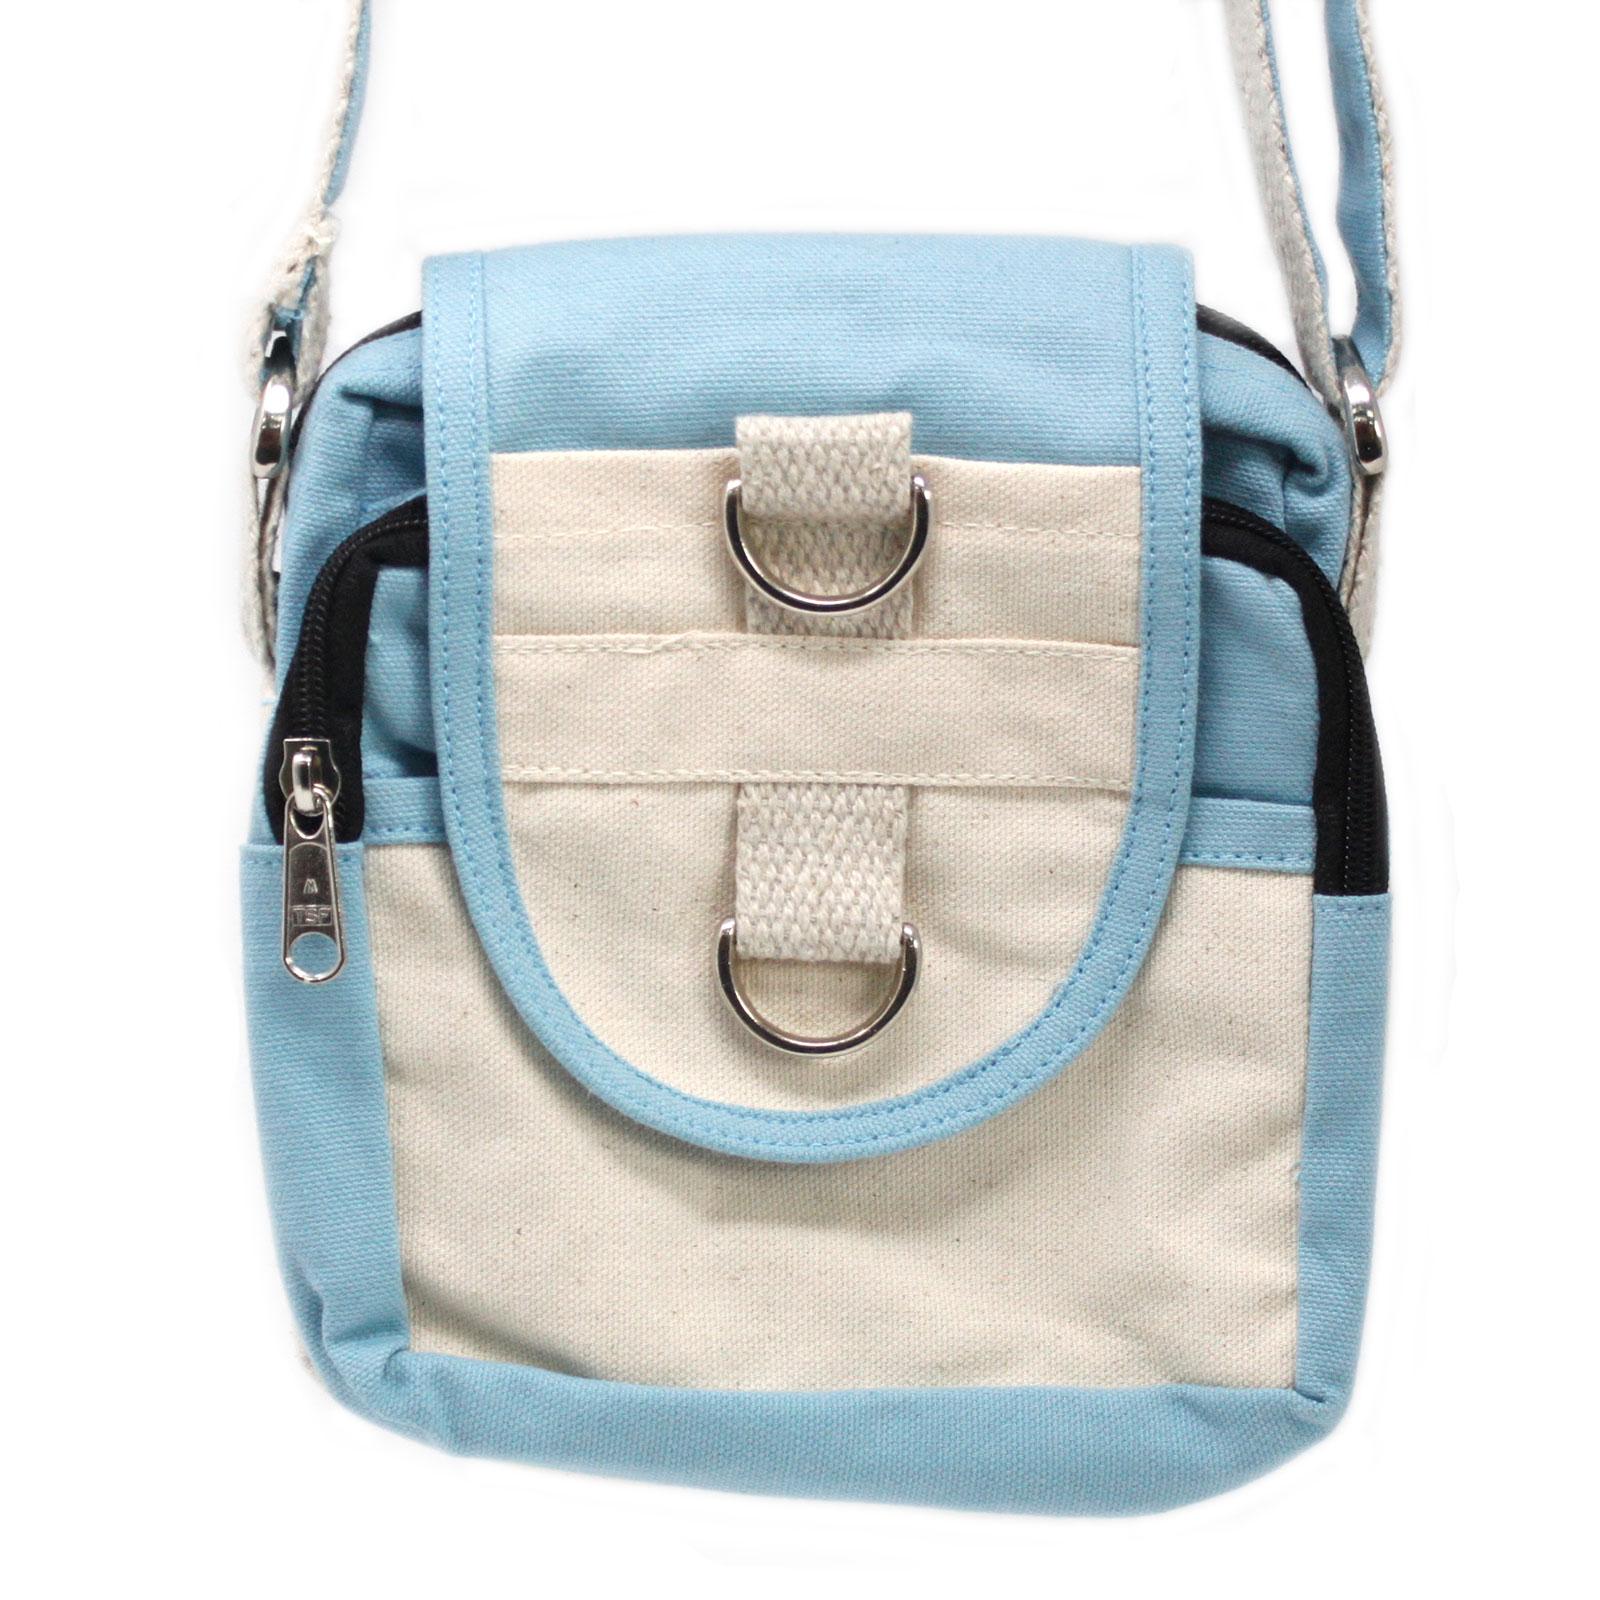 Natural Travel Bag Teal